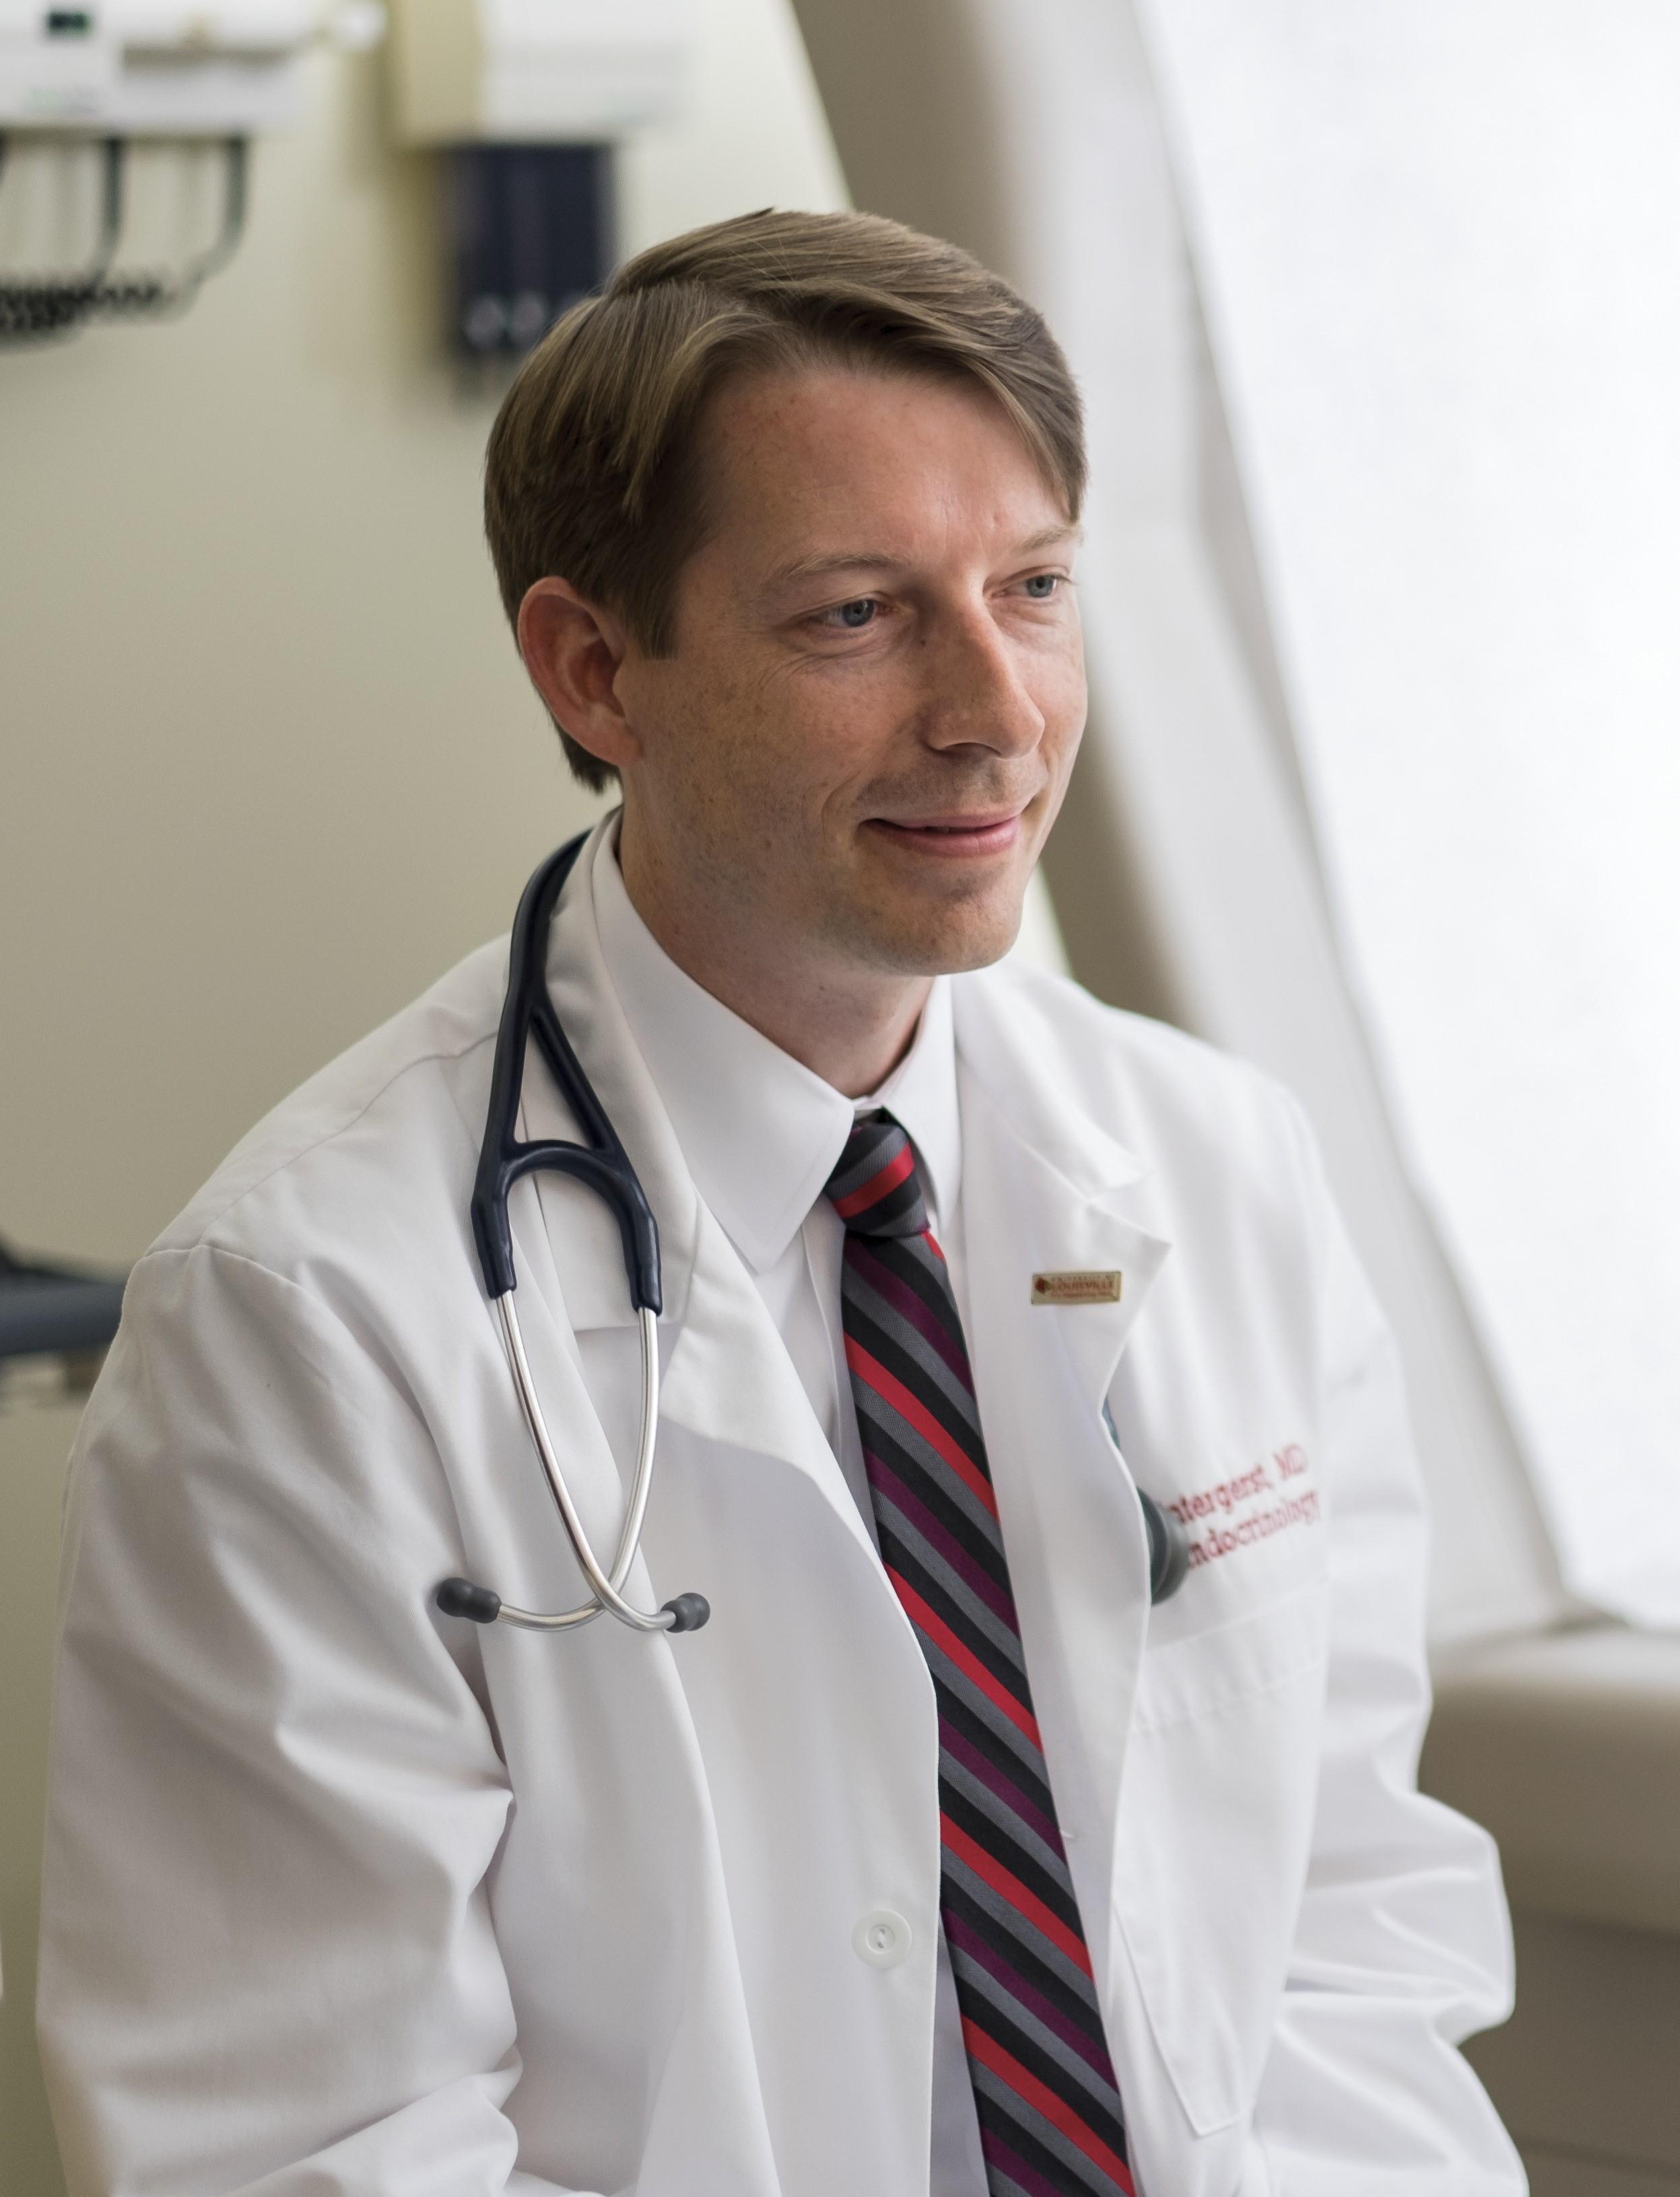 Wendy Novak Diabetes Center at Norton Children's Hospital earns certification for inpatient diabetes care